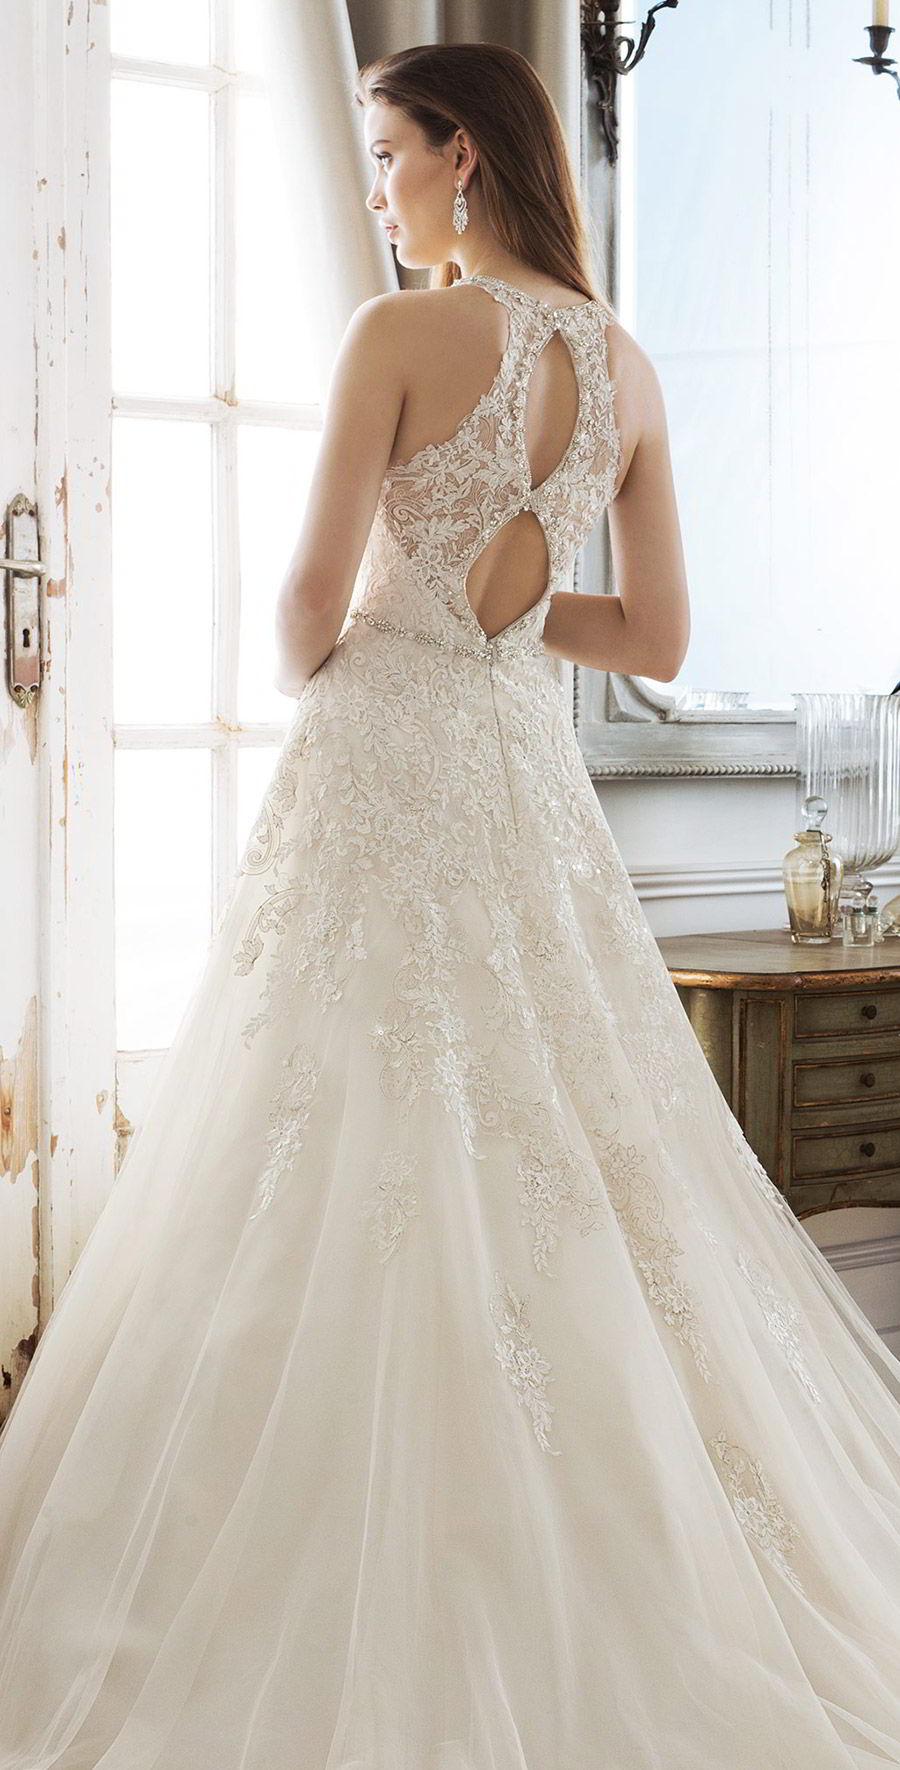 sophia tolli spring 2018 mon cheri bridals sleeveless illusion straps deep v neck beaded waist metallic lace bodice a line wedding dress ( y11878 kali) zbv chapel train romantic